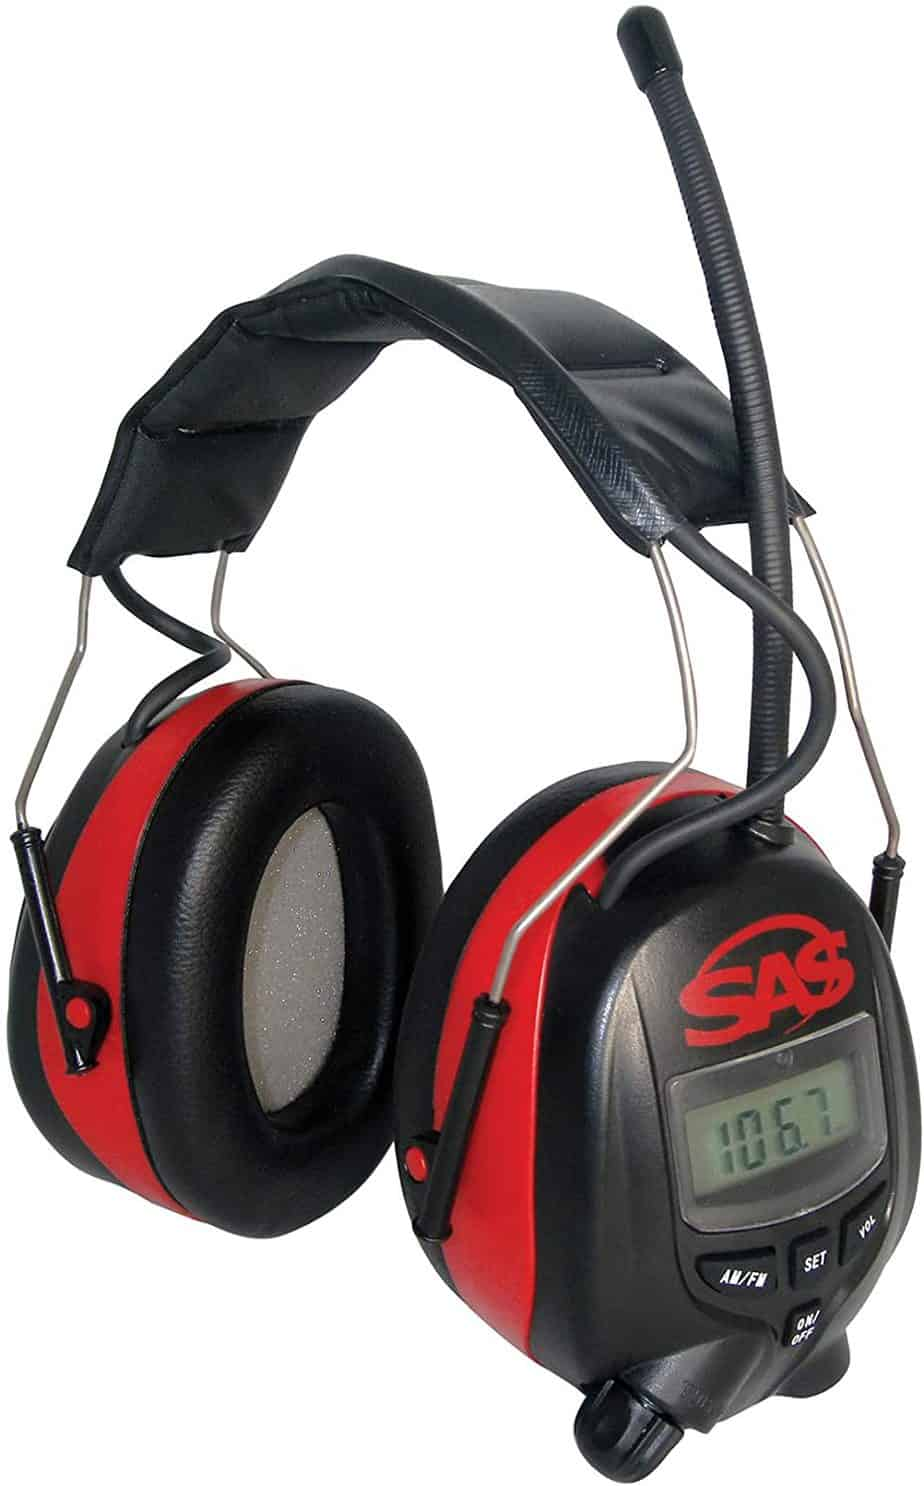 SAS safety digital radio earmuffs-best am FM radio headphones